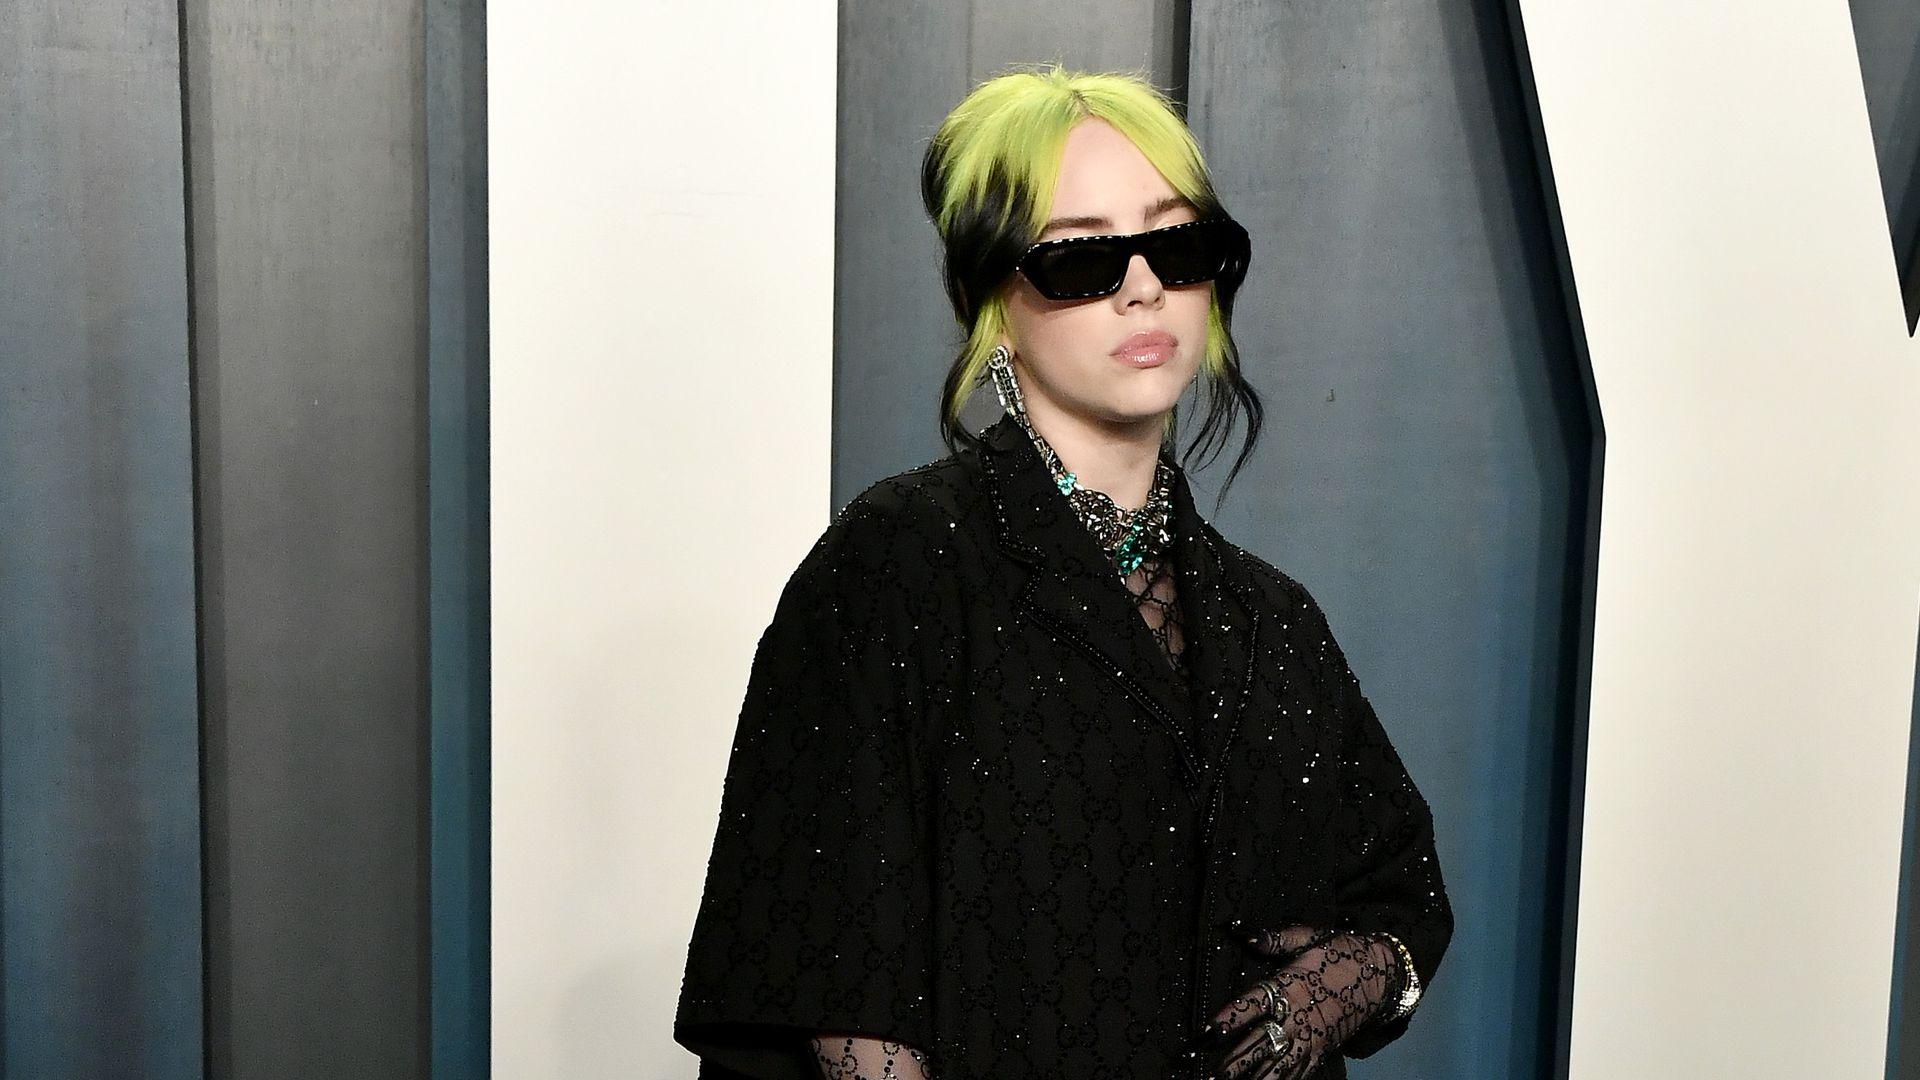 Billie Eilish Enge Kleidung